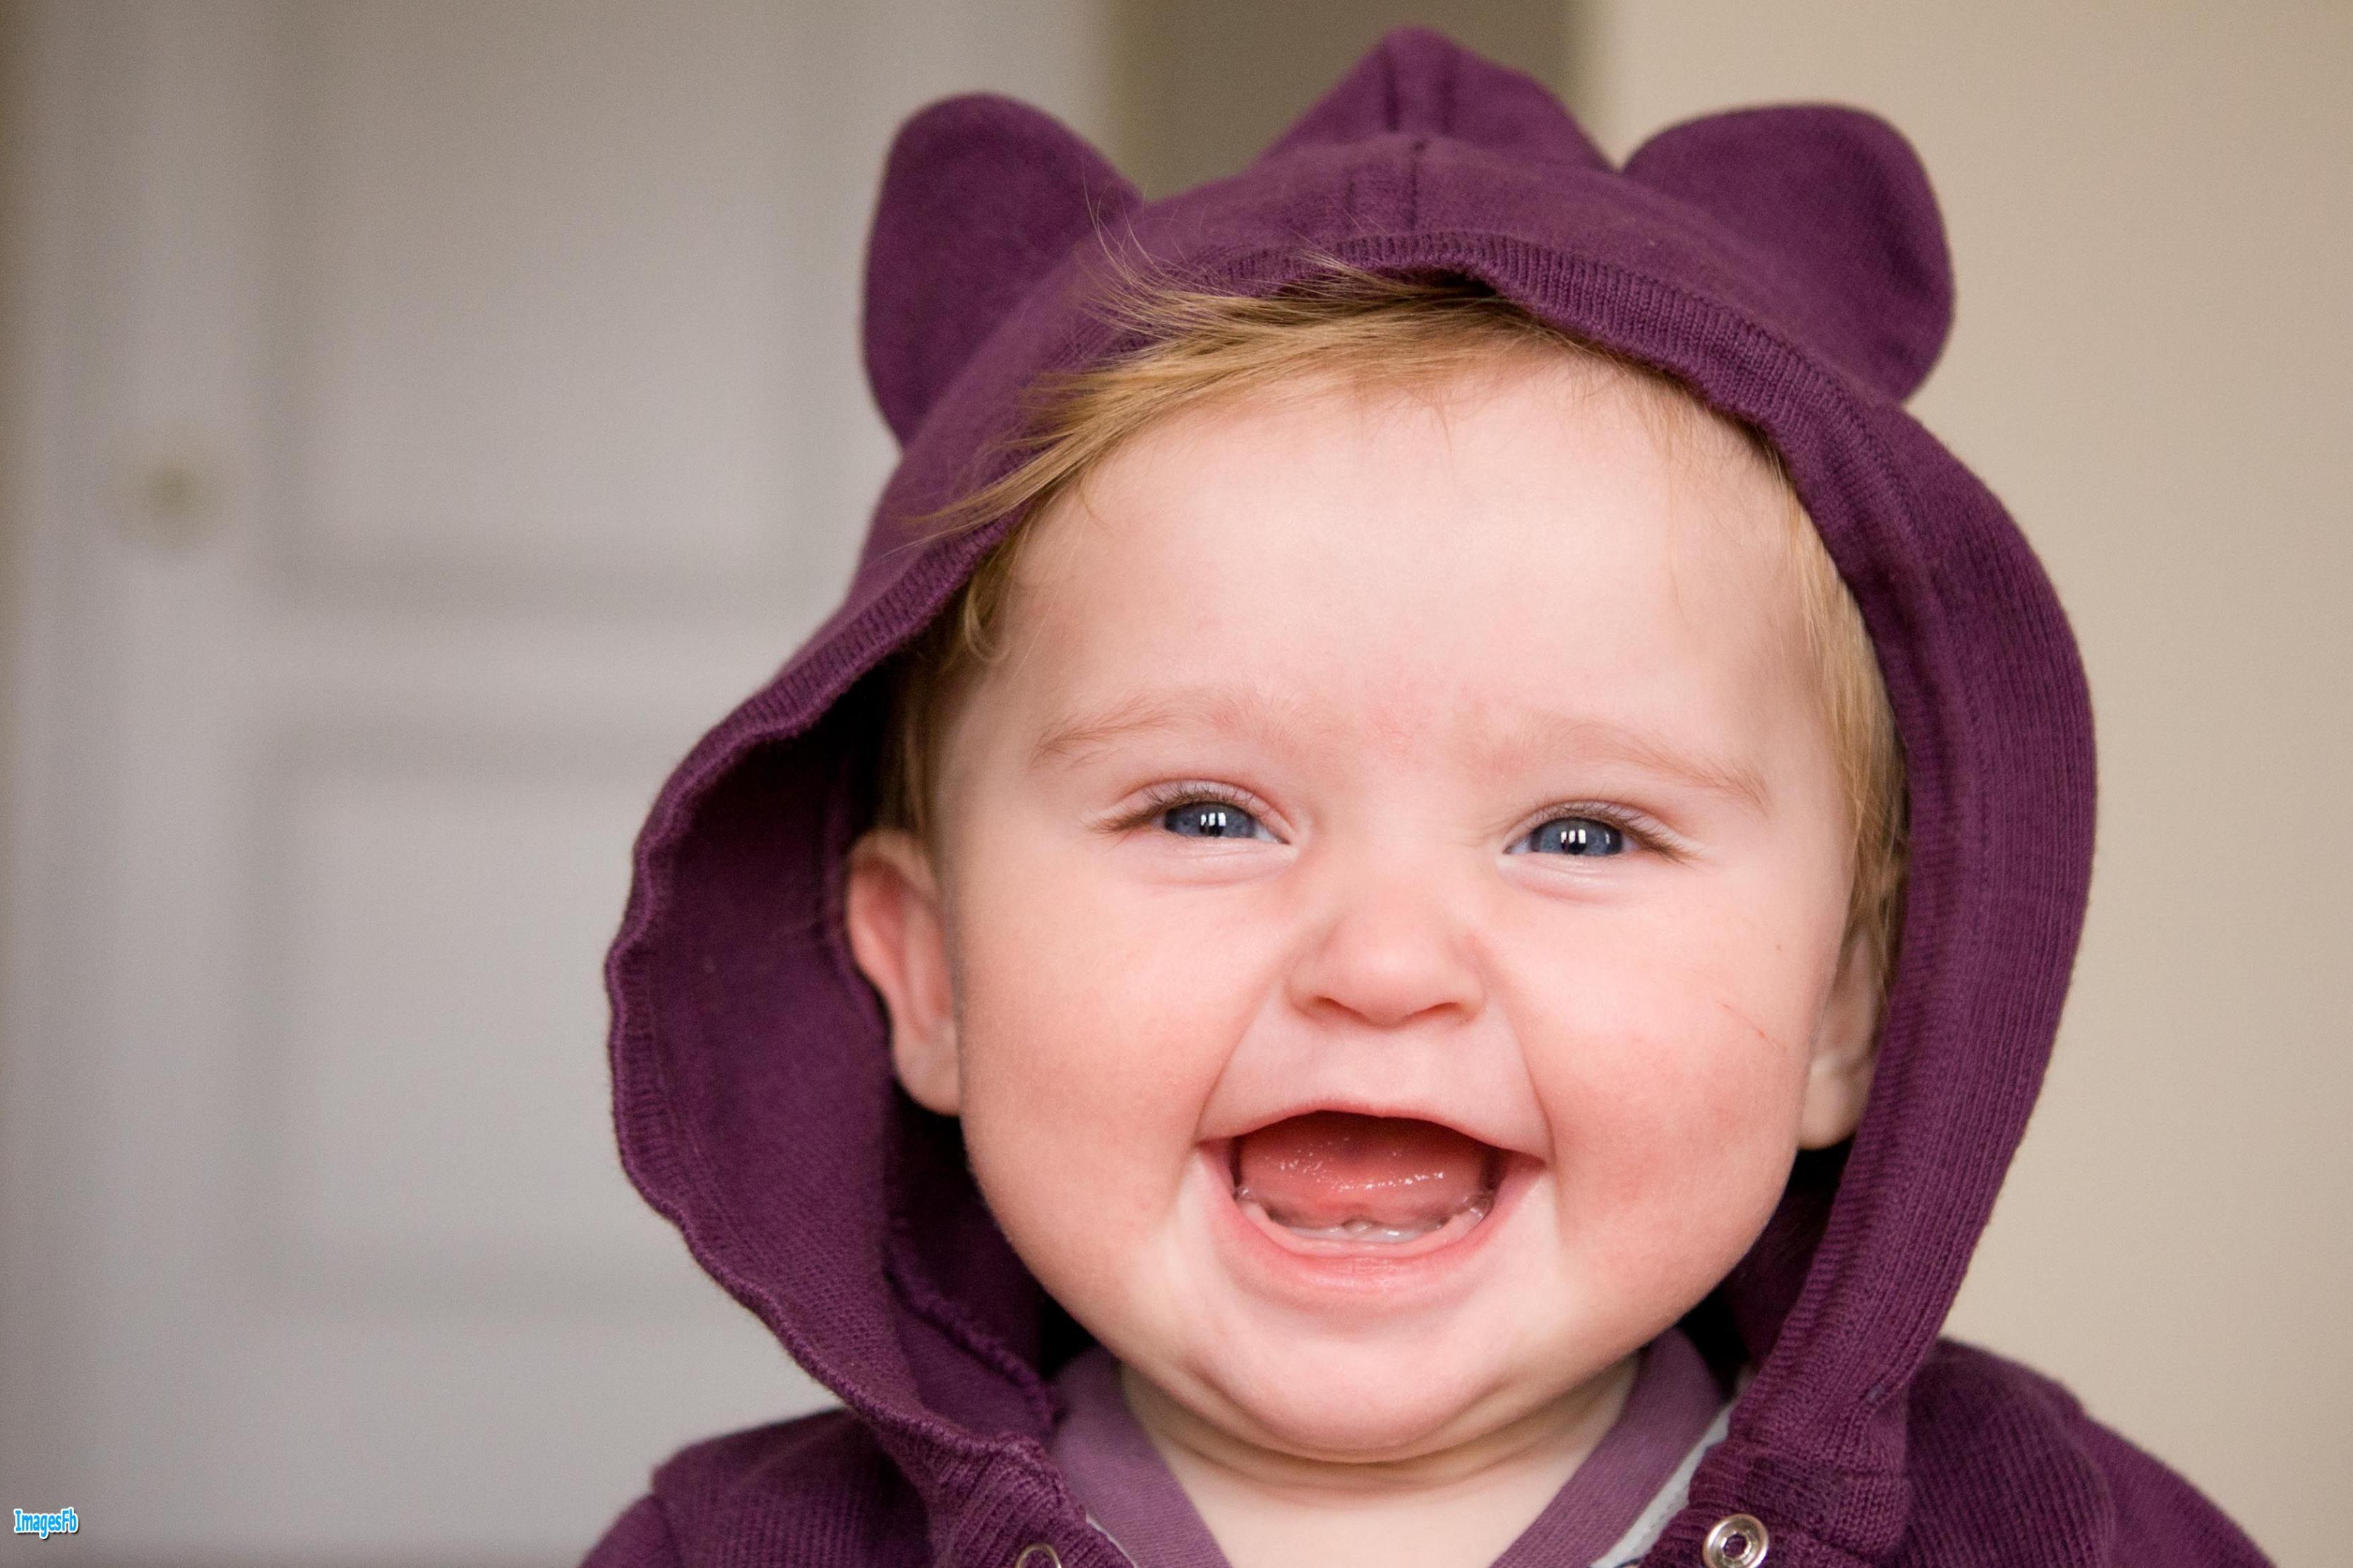 بالصور صور اطفال متحركه , صور اطفال تضحك روعه 4390 1